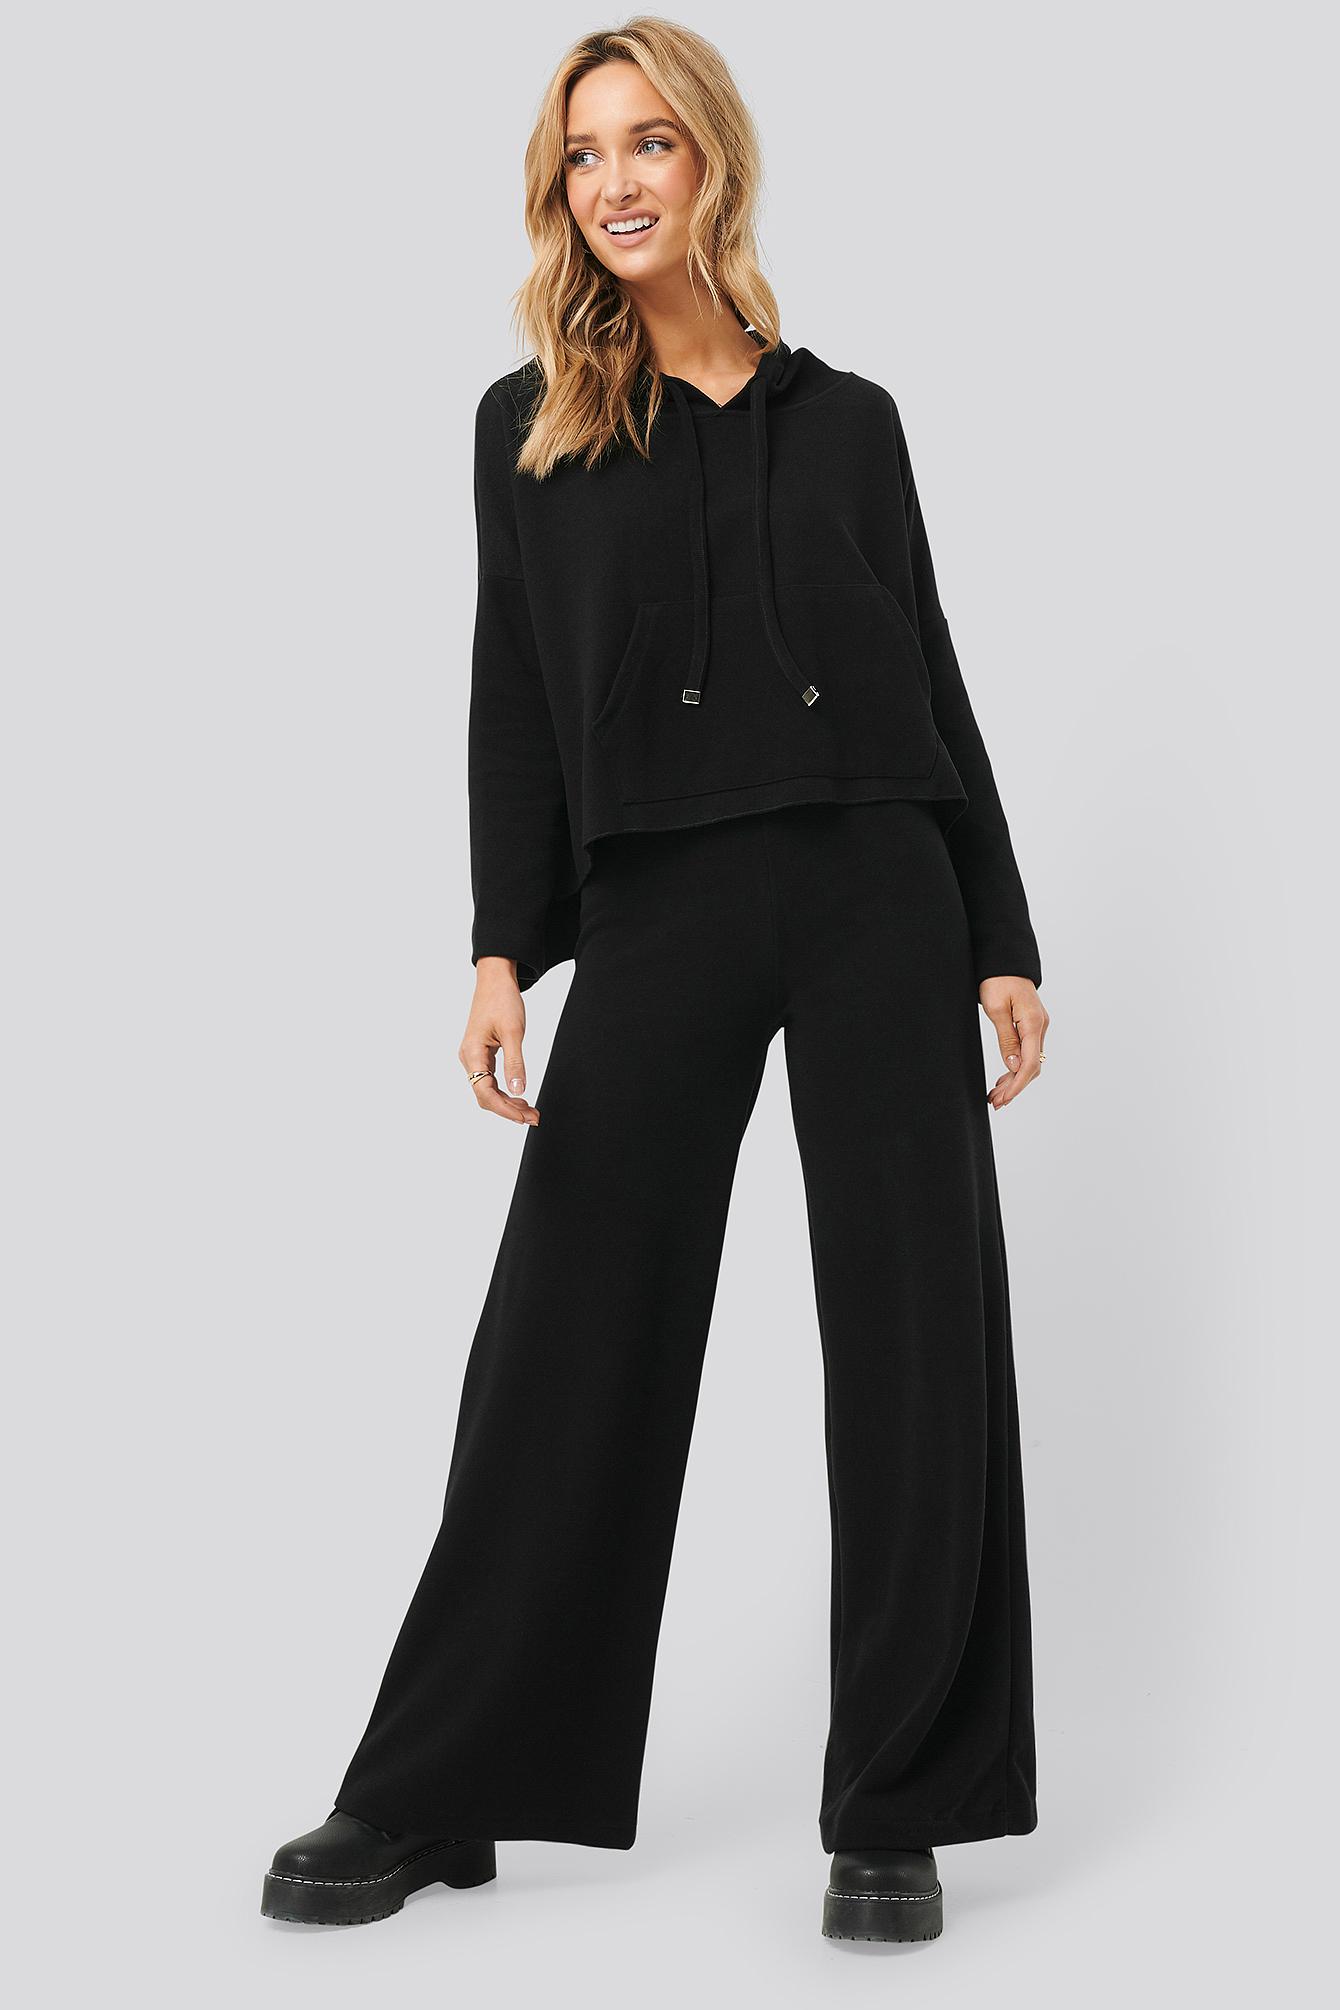 trendyol -  Trot Trousers - Black